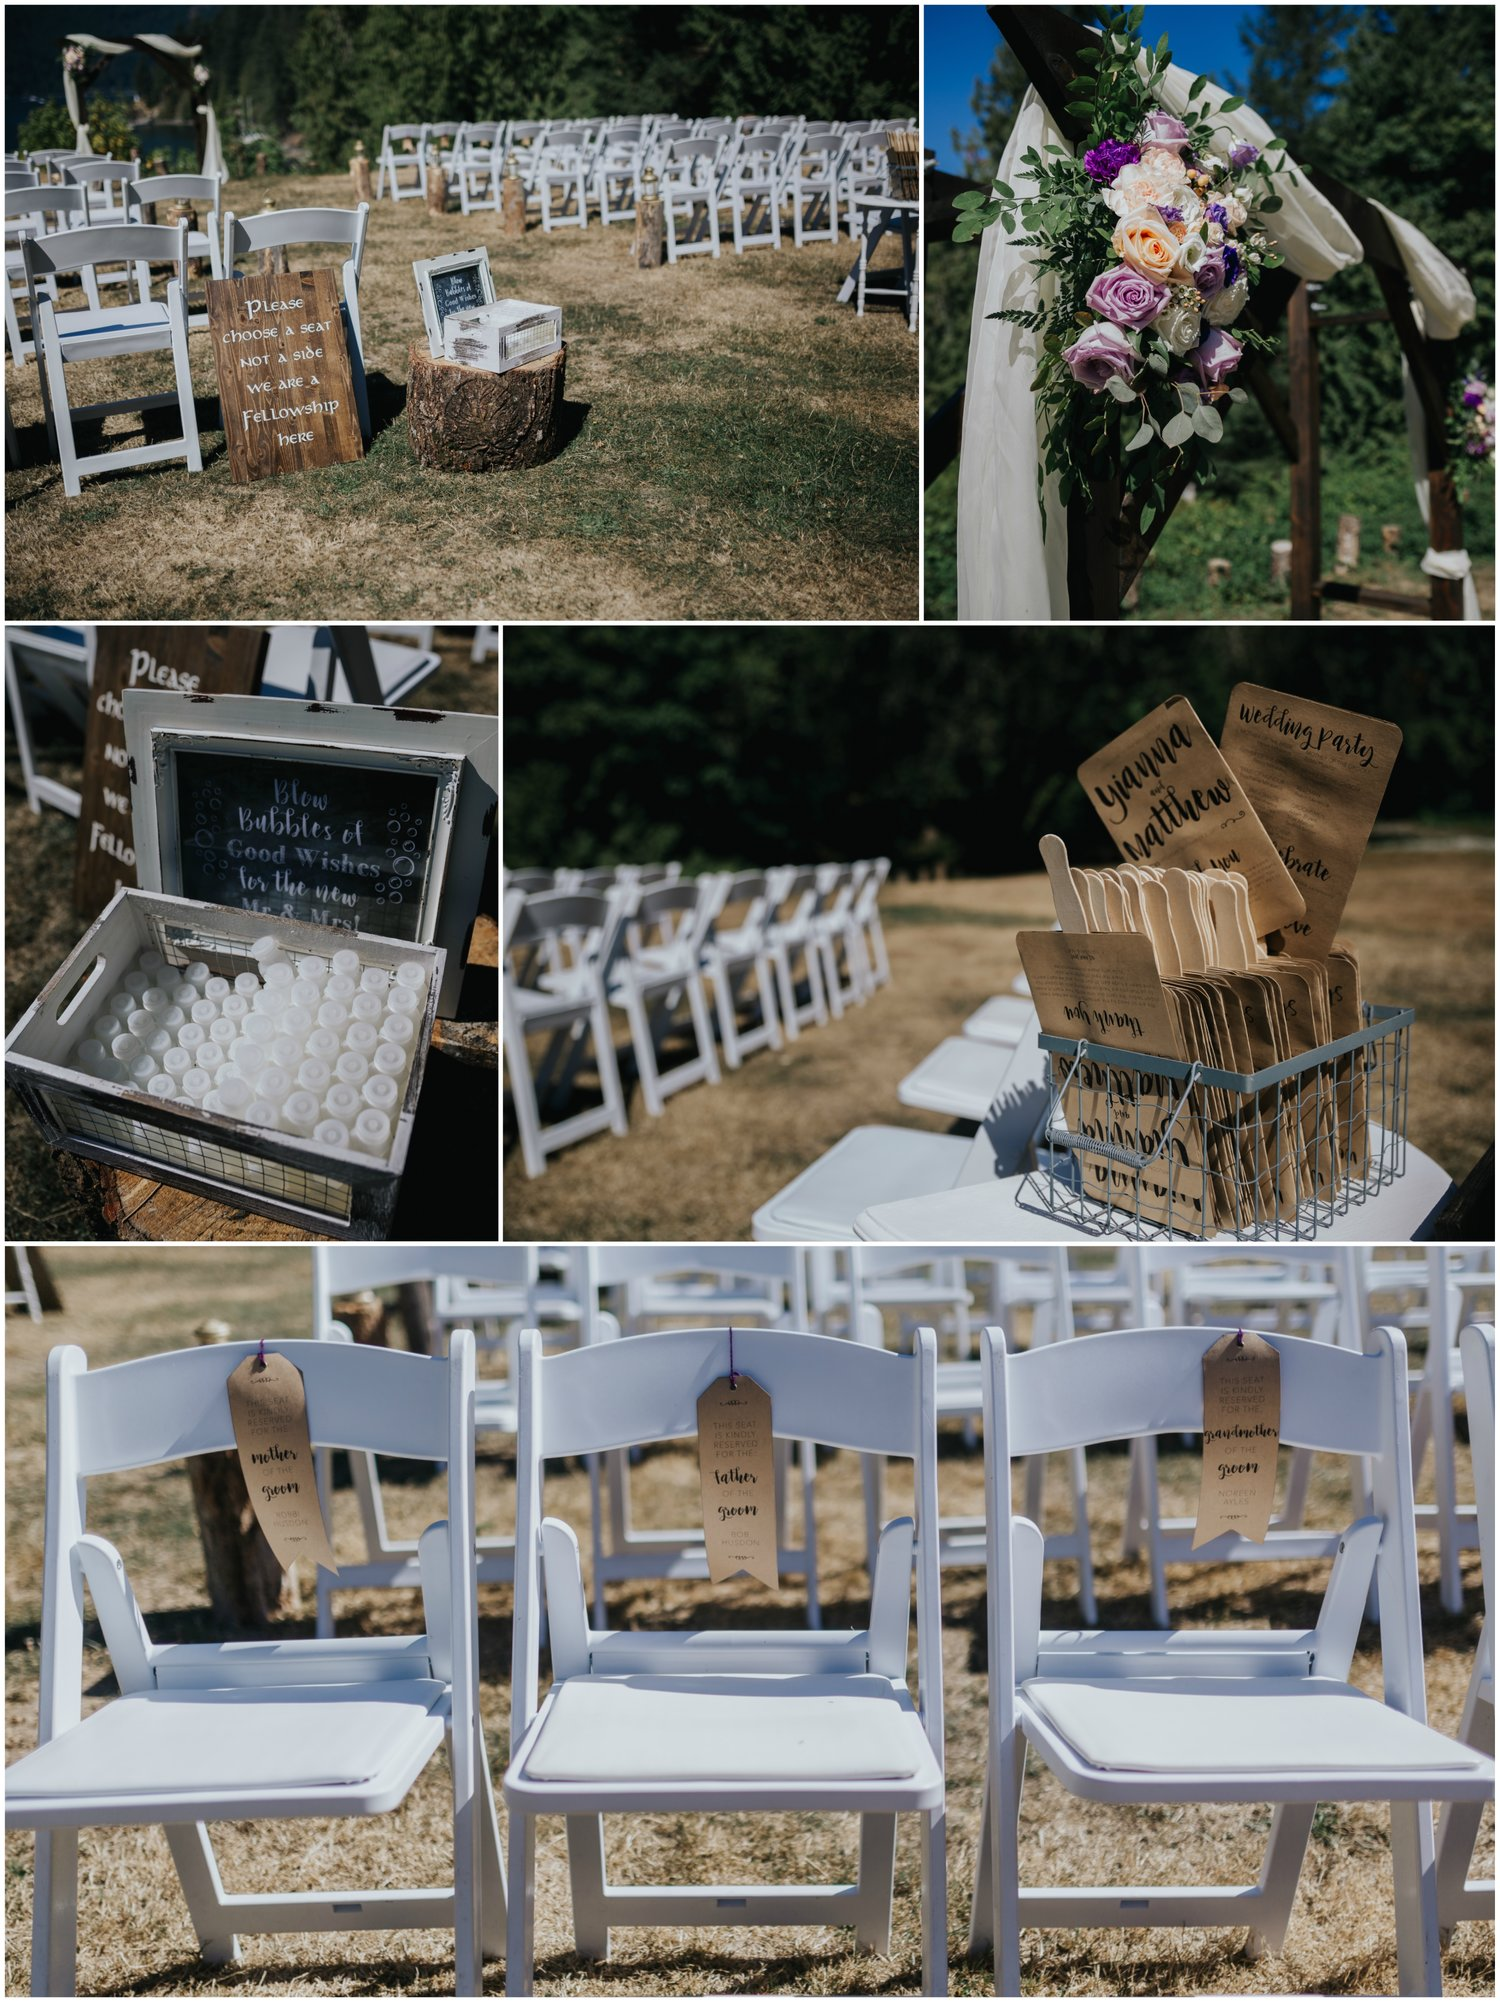 Camp+Howdy+Rustic+Cabin+Wedding+Ceremony+Details.jpg